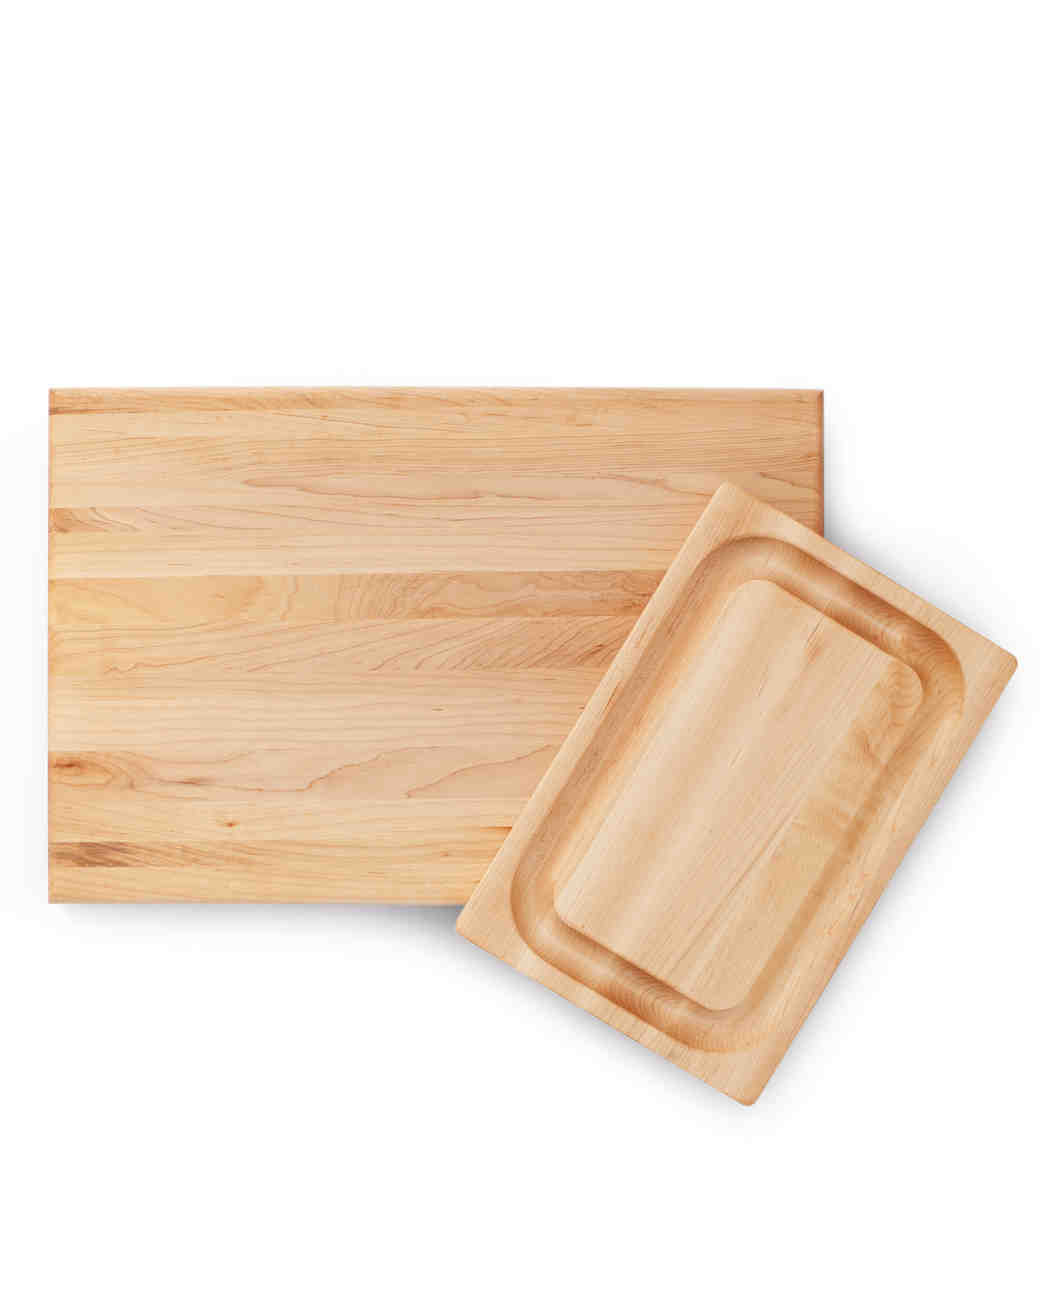 boos-boards-096-mwd110671.jpg